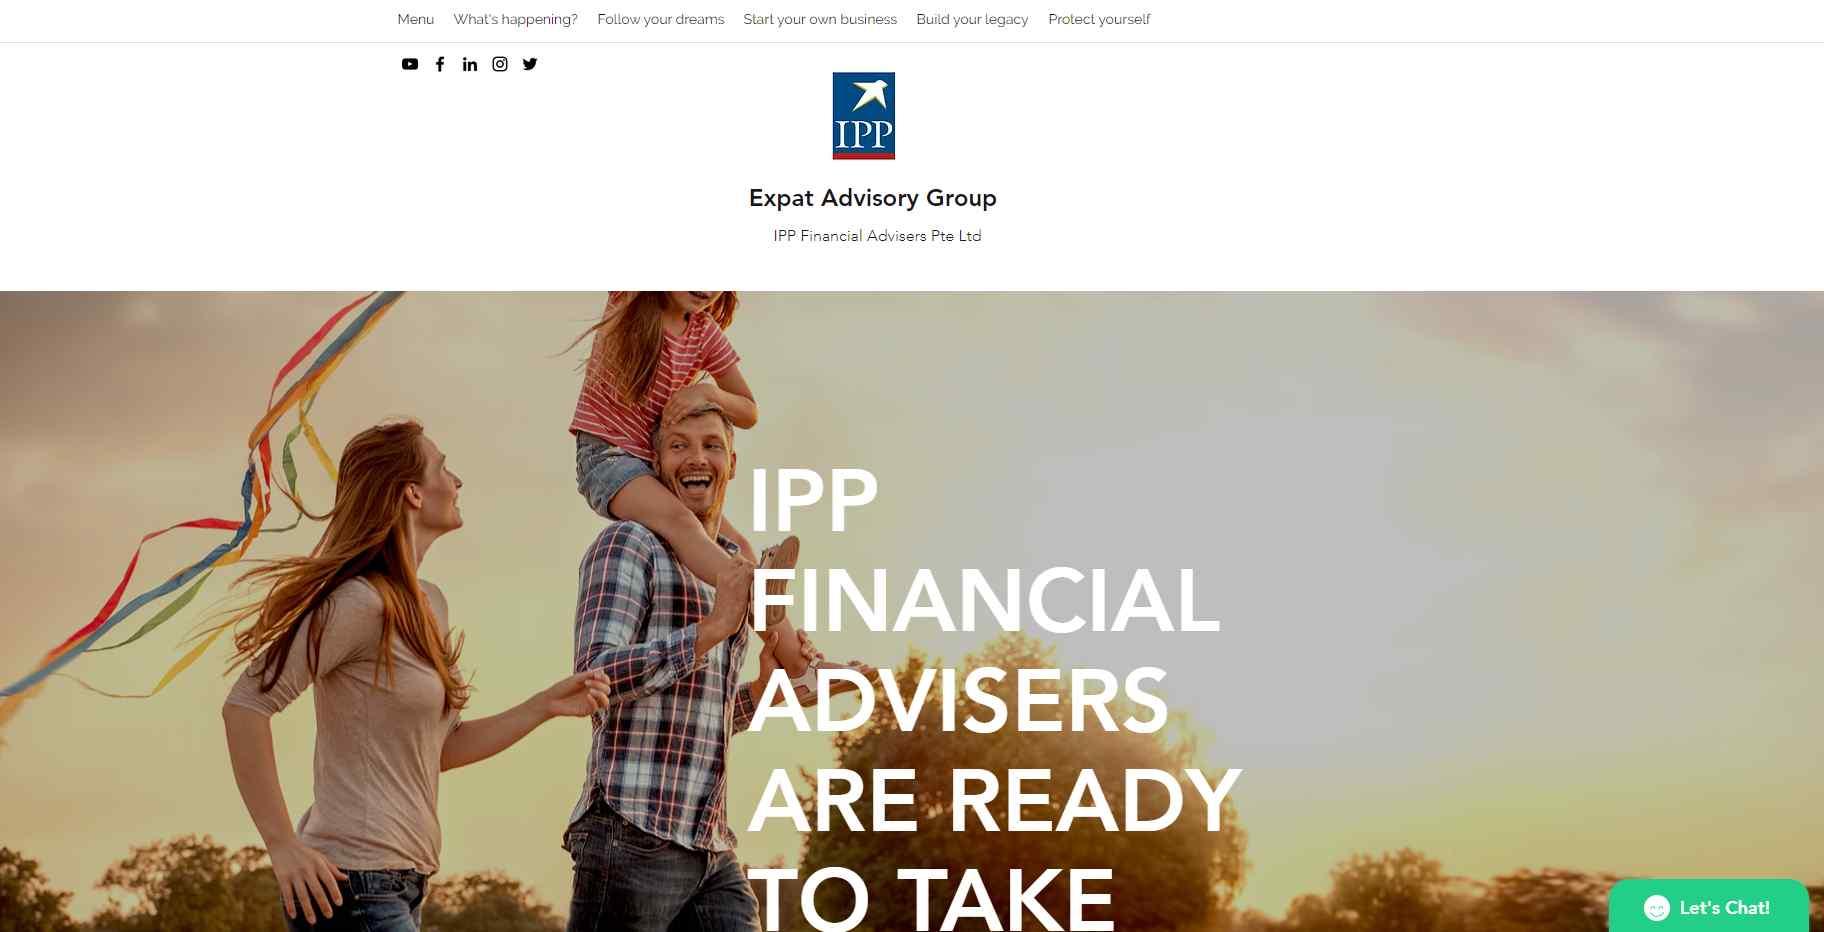 ipp Top Financial Advisors in Singapore